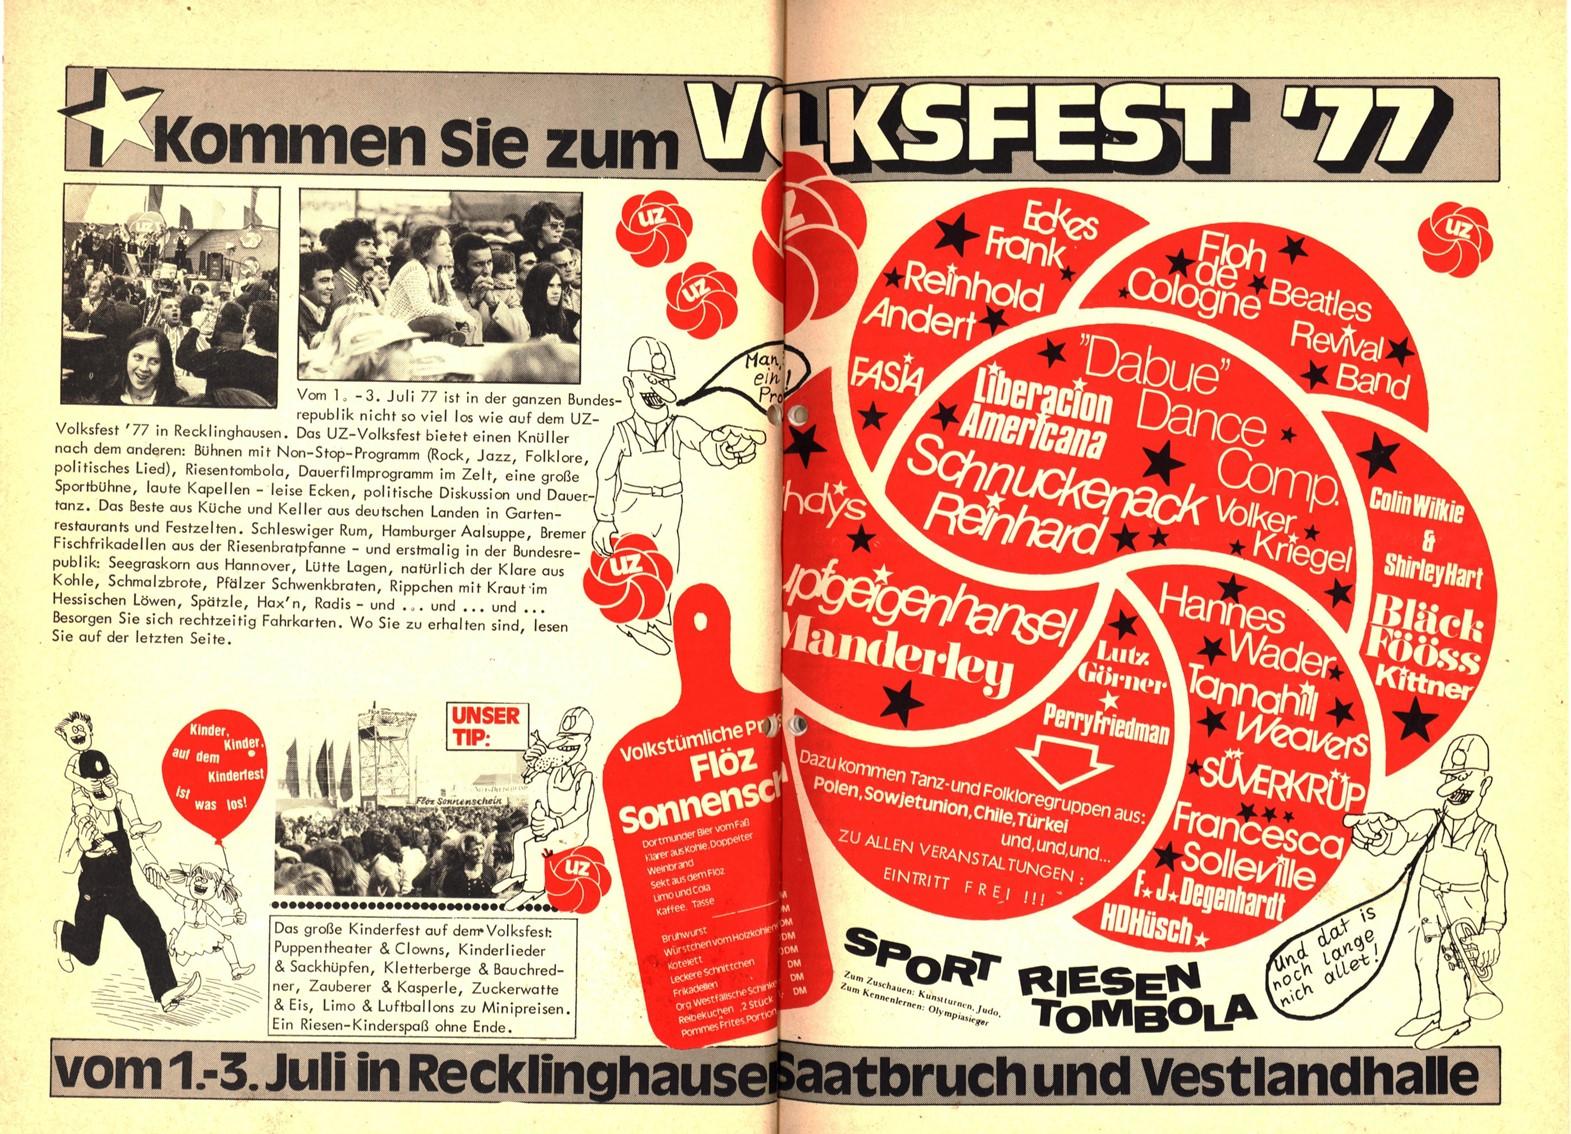 GE_DKP_Stahlstimme_19770600_02